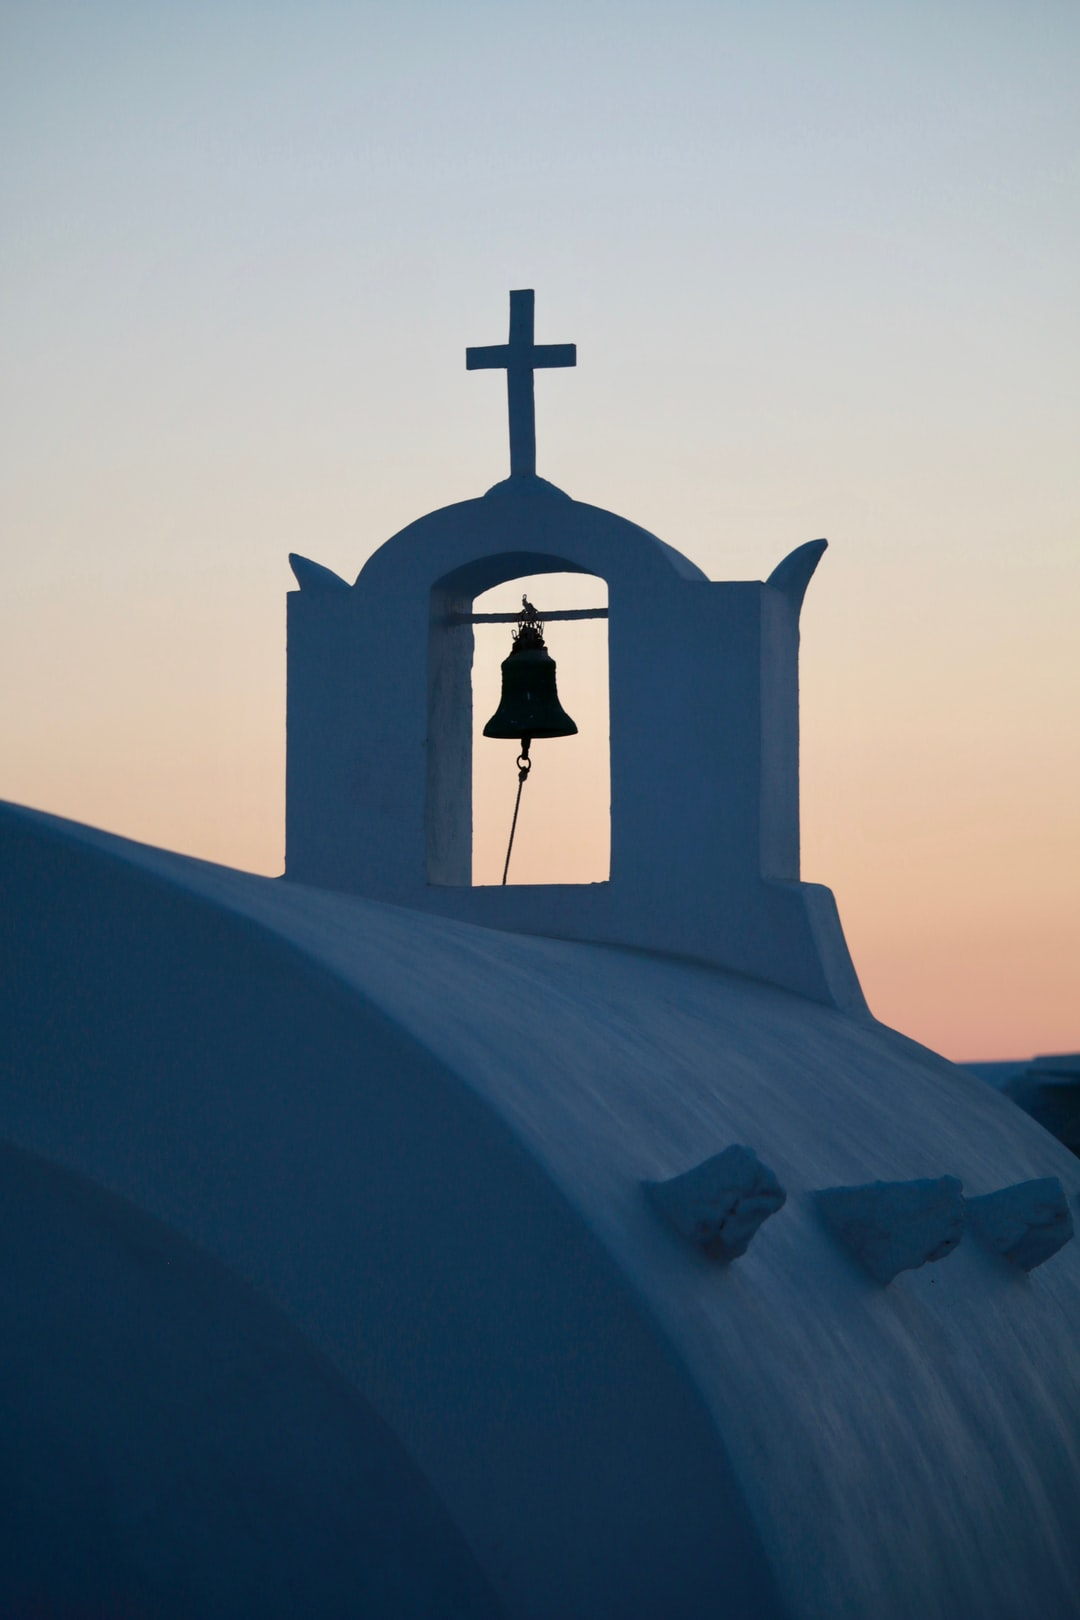 Church bell in Oia, Santorini, Greece